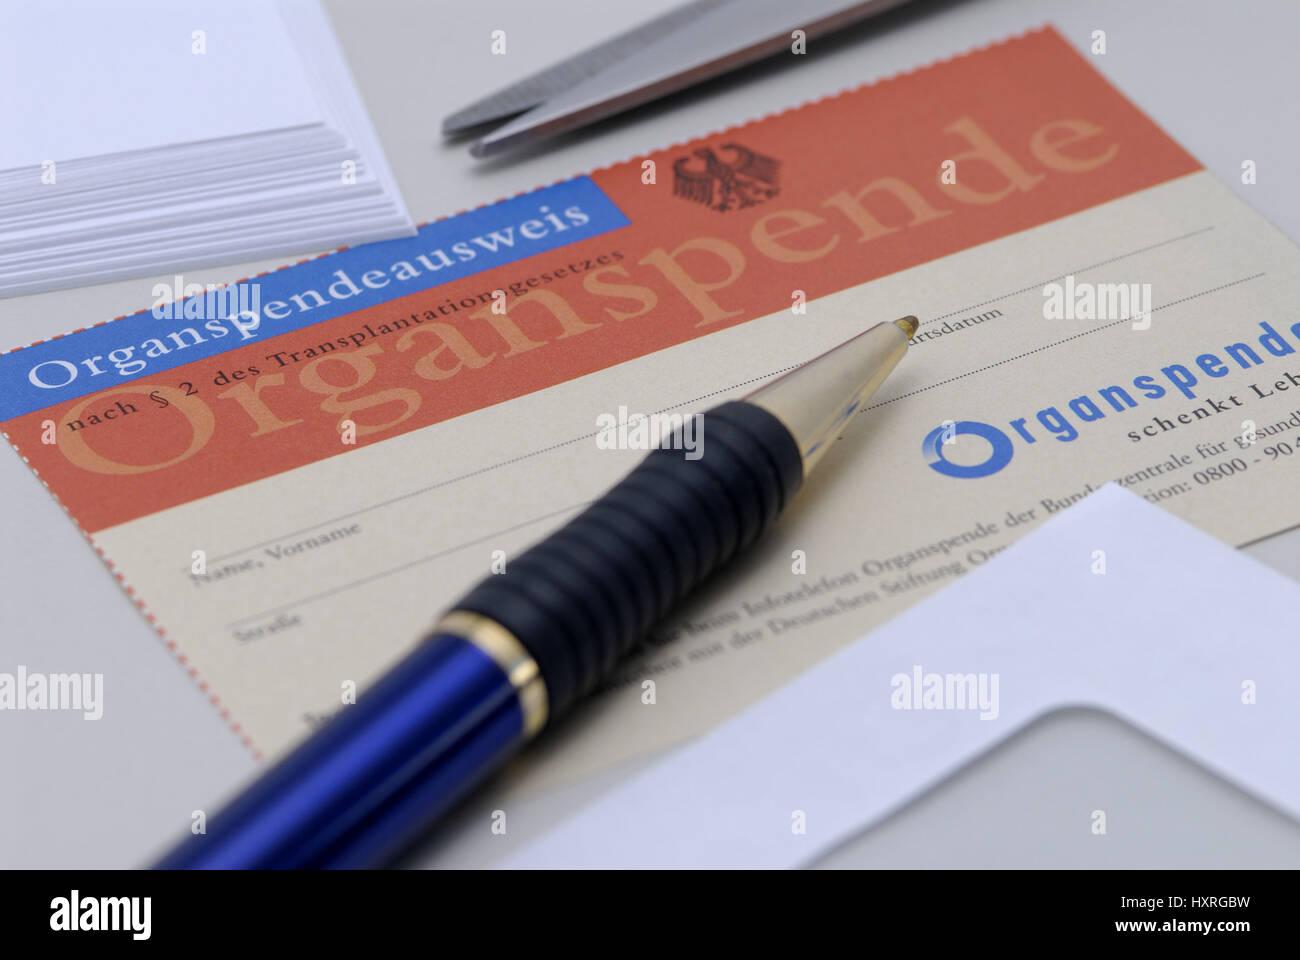 Organ donation, medicine, transplant, transplants, organ, organs, human, identity card, identity cards, organ donation - Stock Image